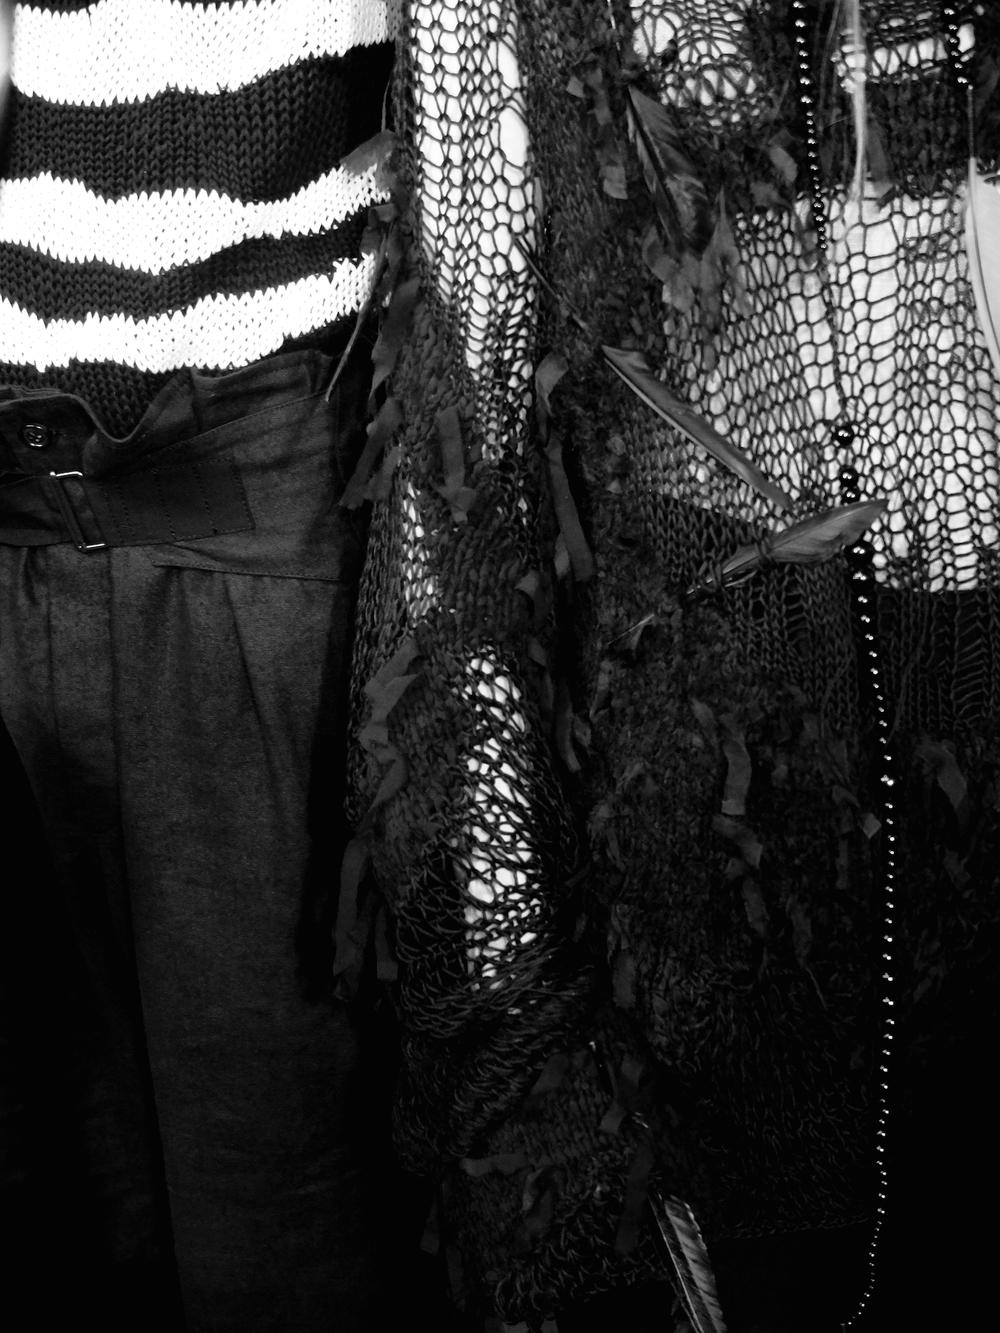 Backstage_SS17_Paris_Lisa_Lapierre_Behind_The_Blinds_53.JPG